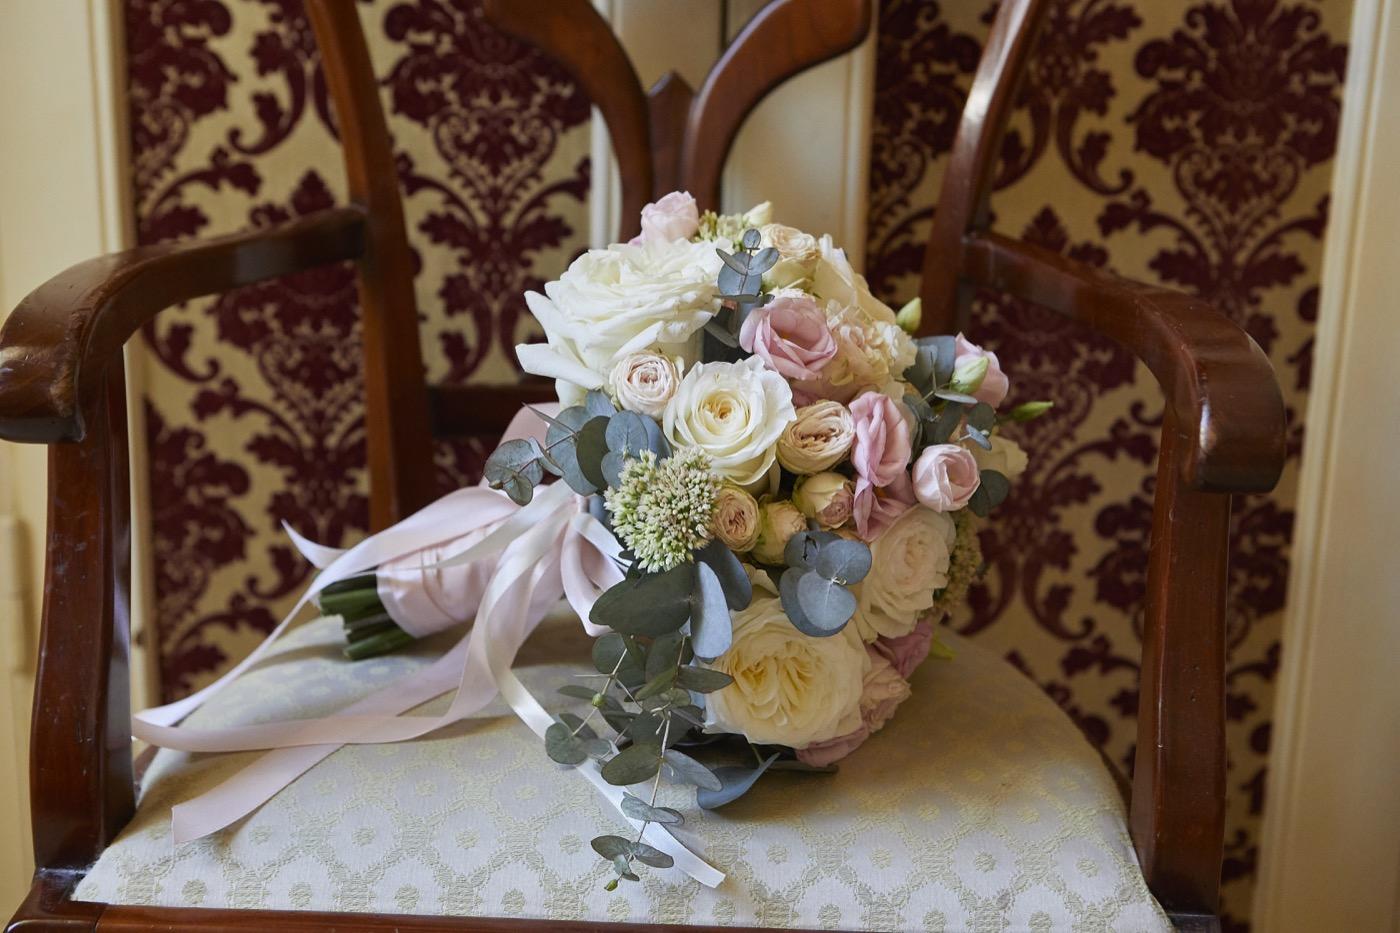 Claudio-Coppola-wedding-photographer-la-scuderia-eventi-preparativi-la-rosetta-perugia-3